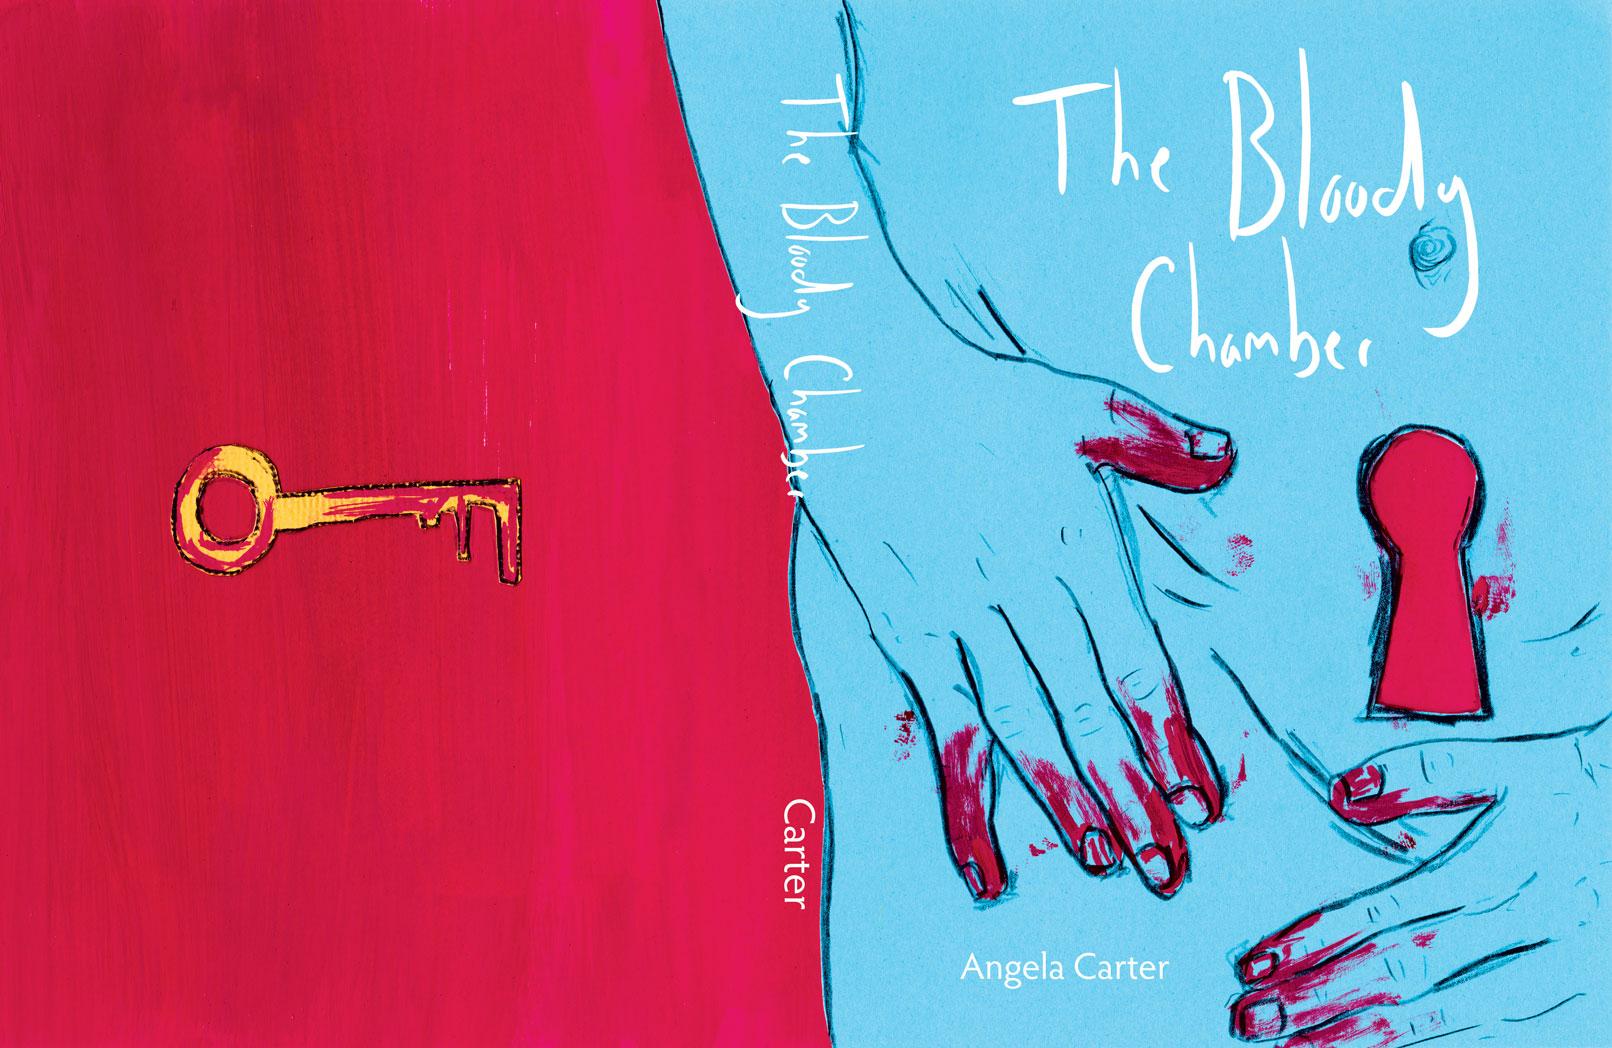 Chloe-Dennis-Full-Cover-Text-Bloody.jpg